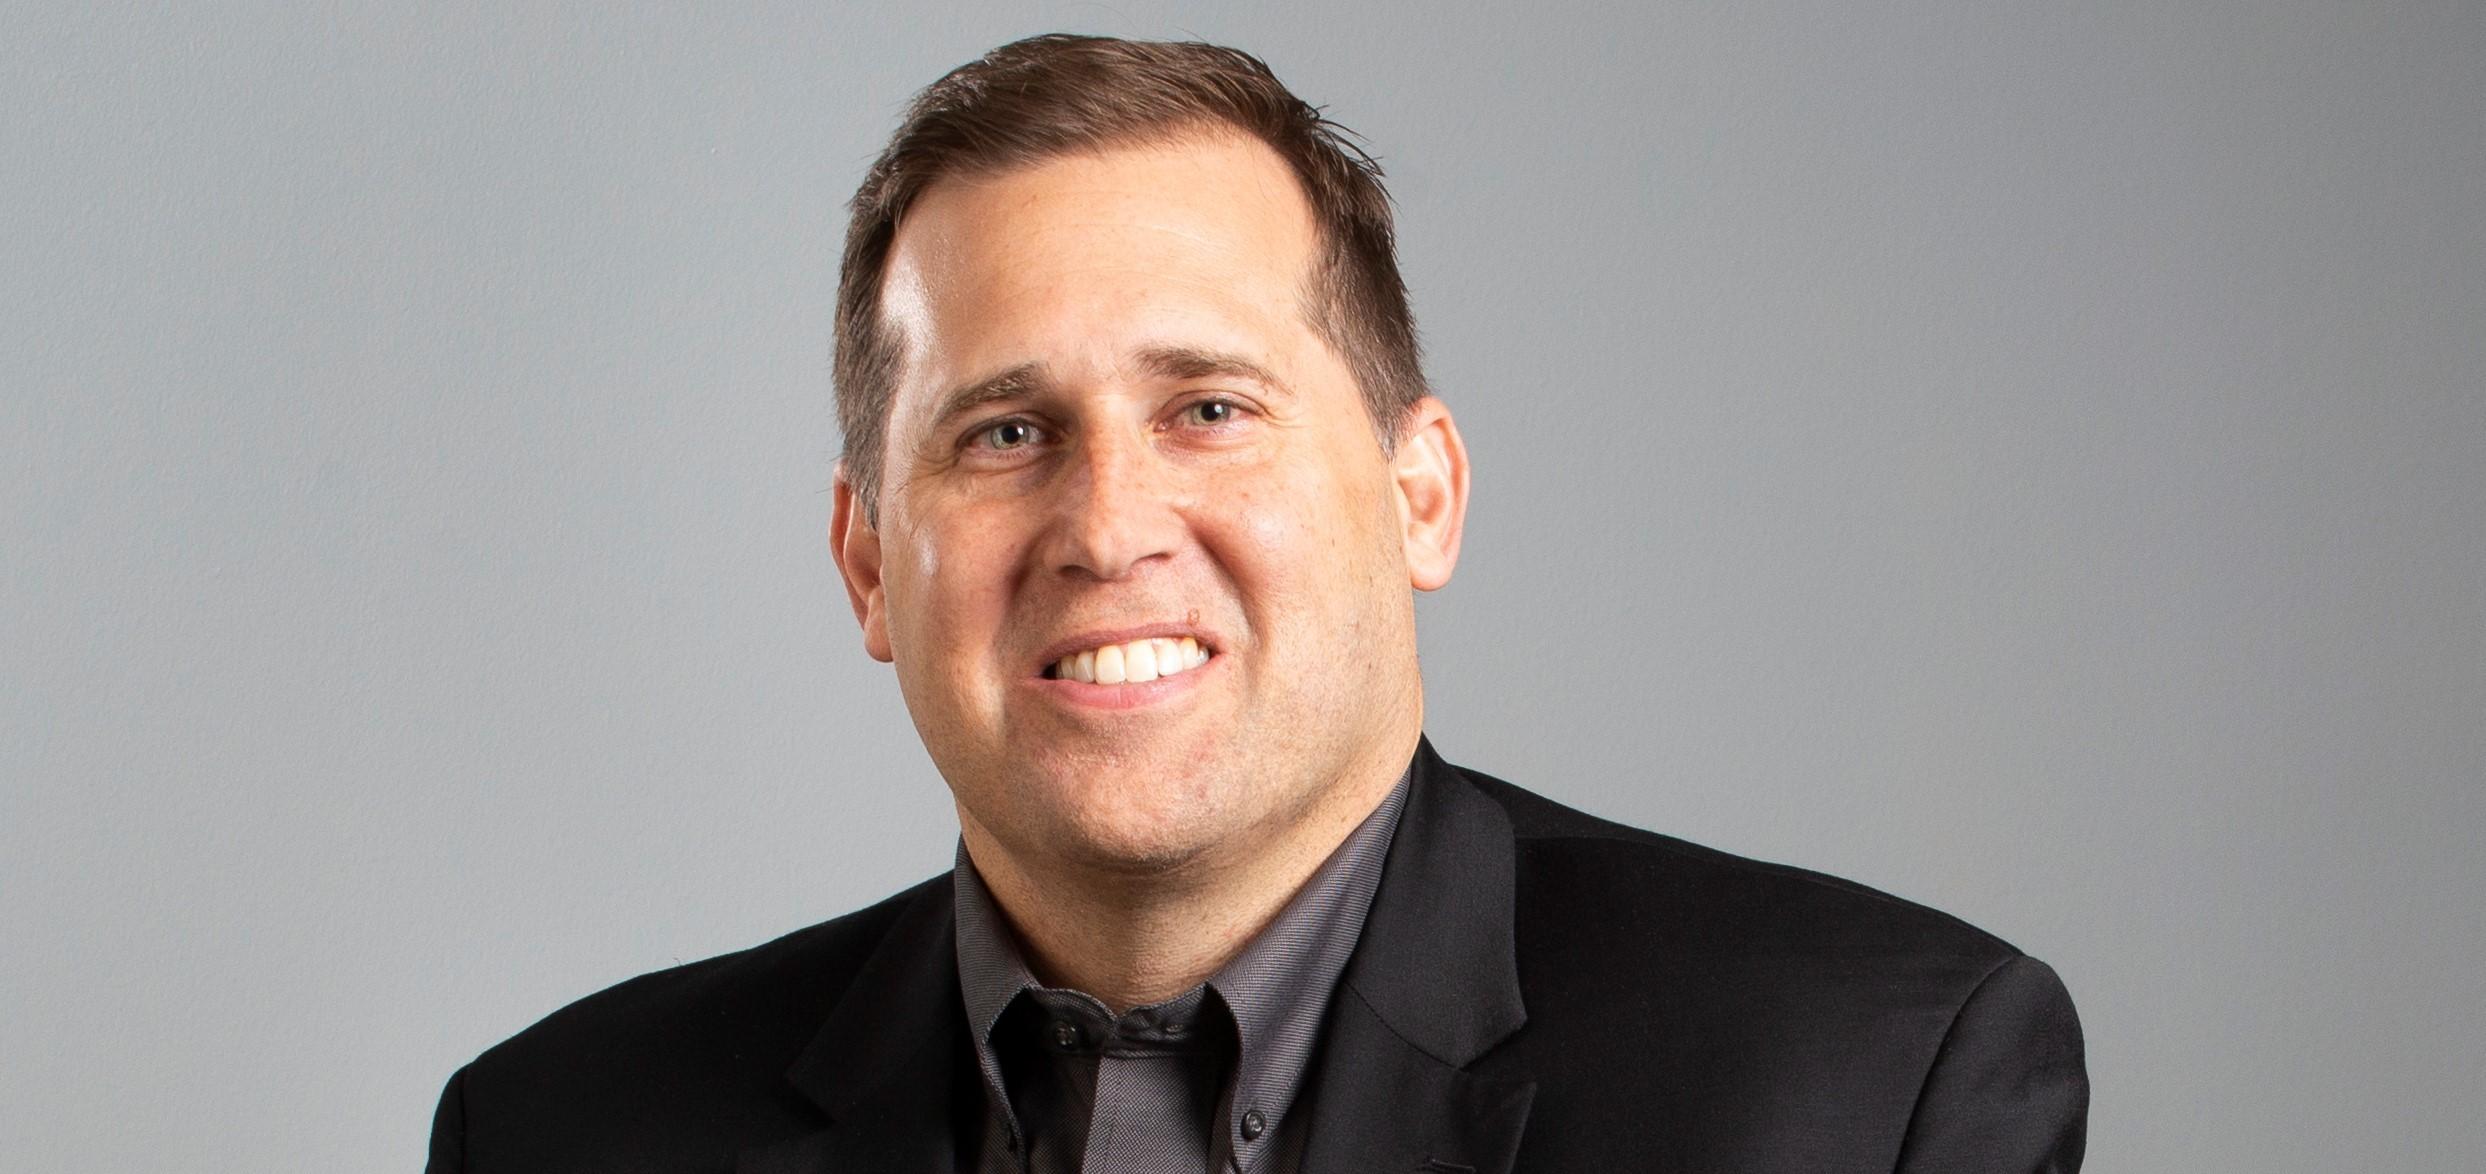 Gilmore CEO David Nemetz